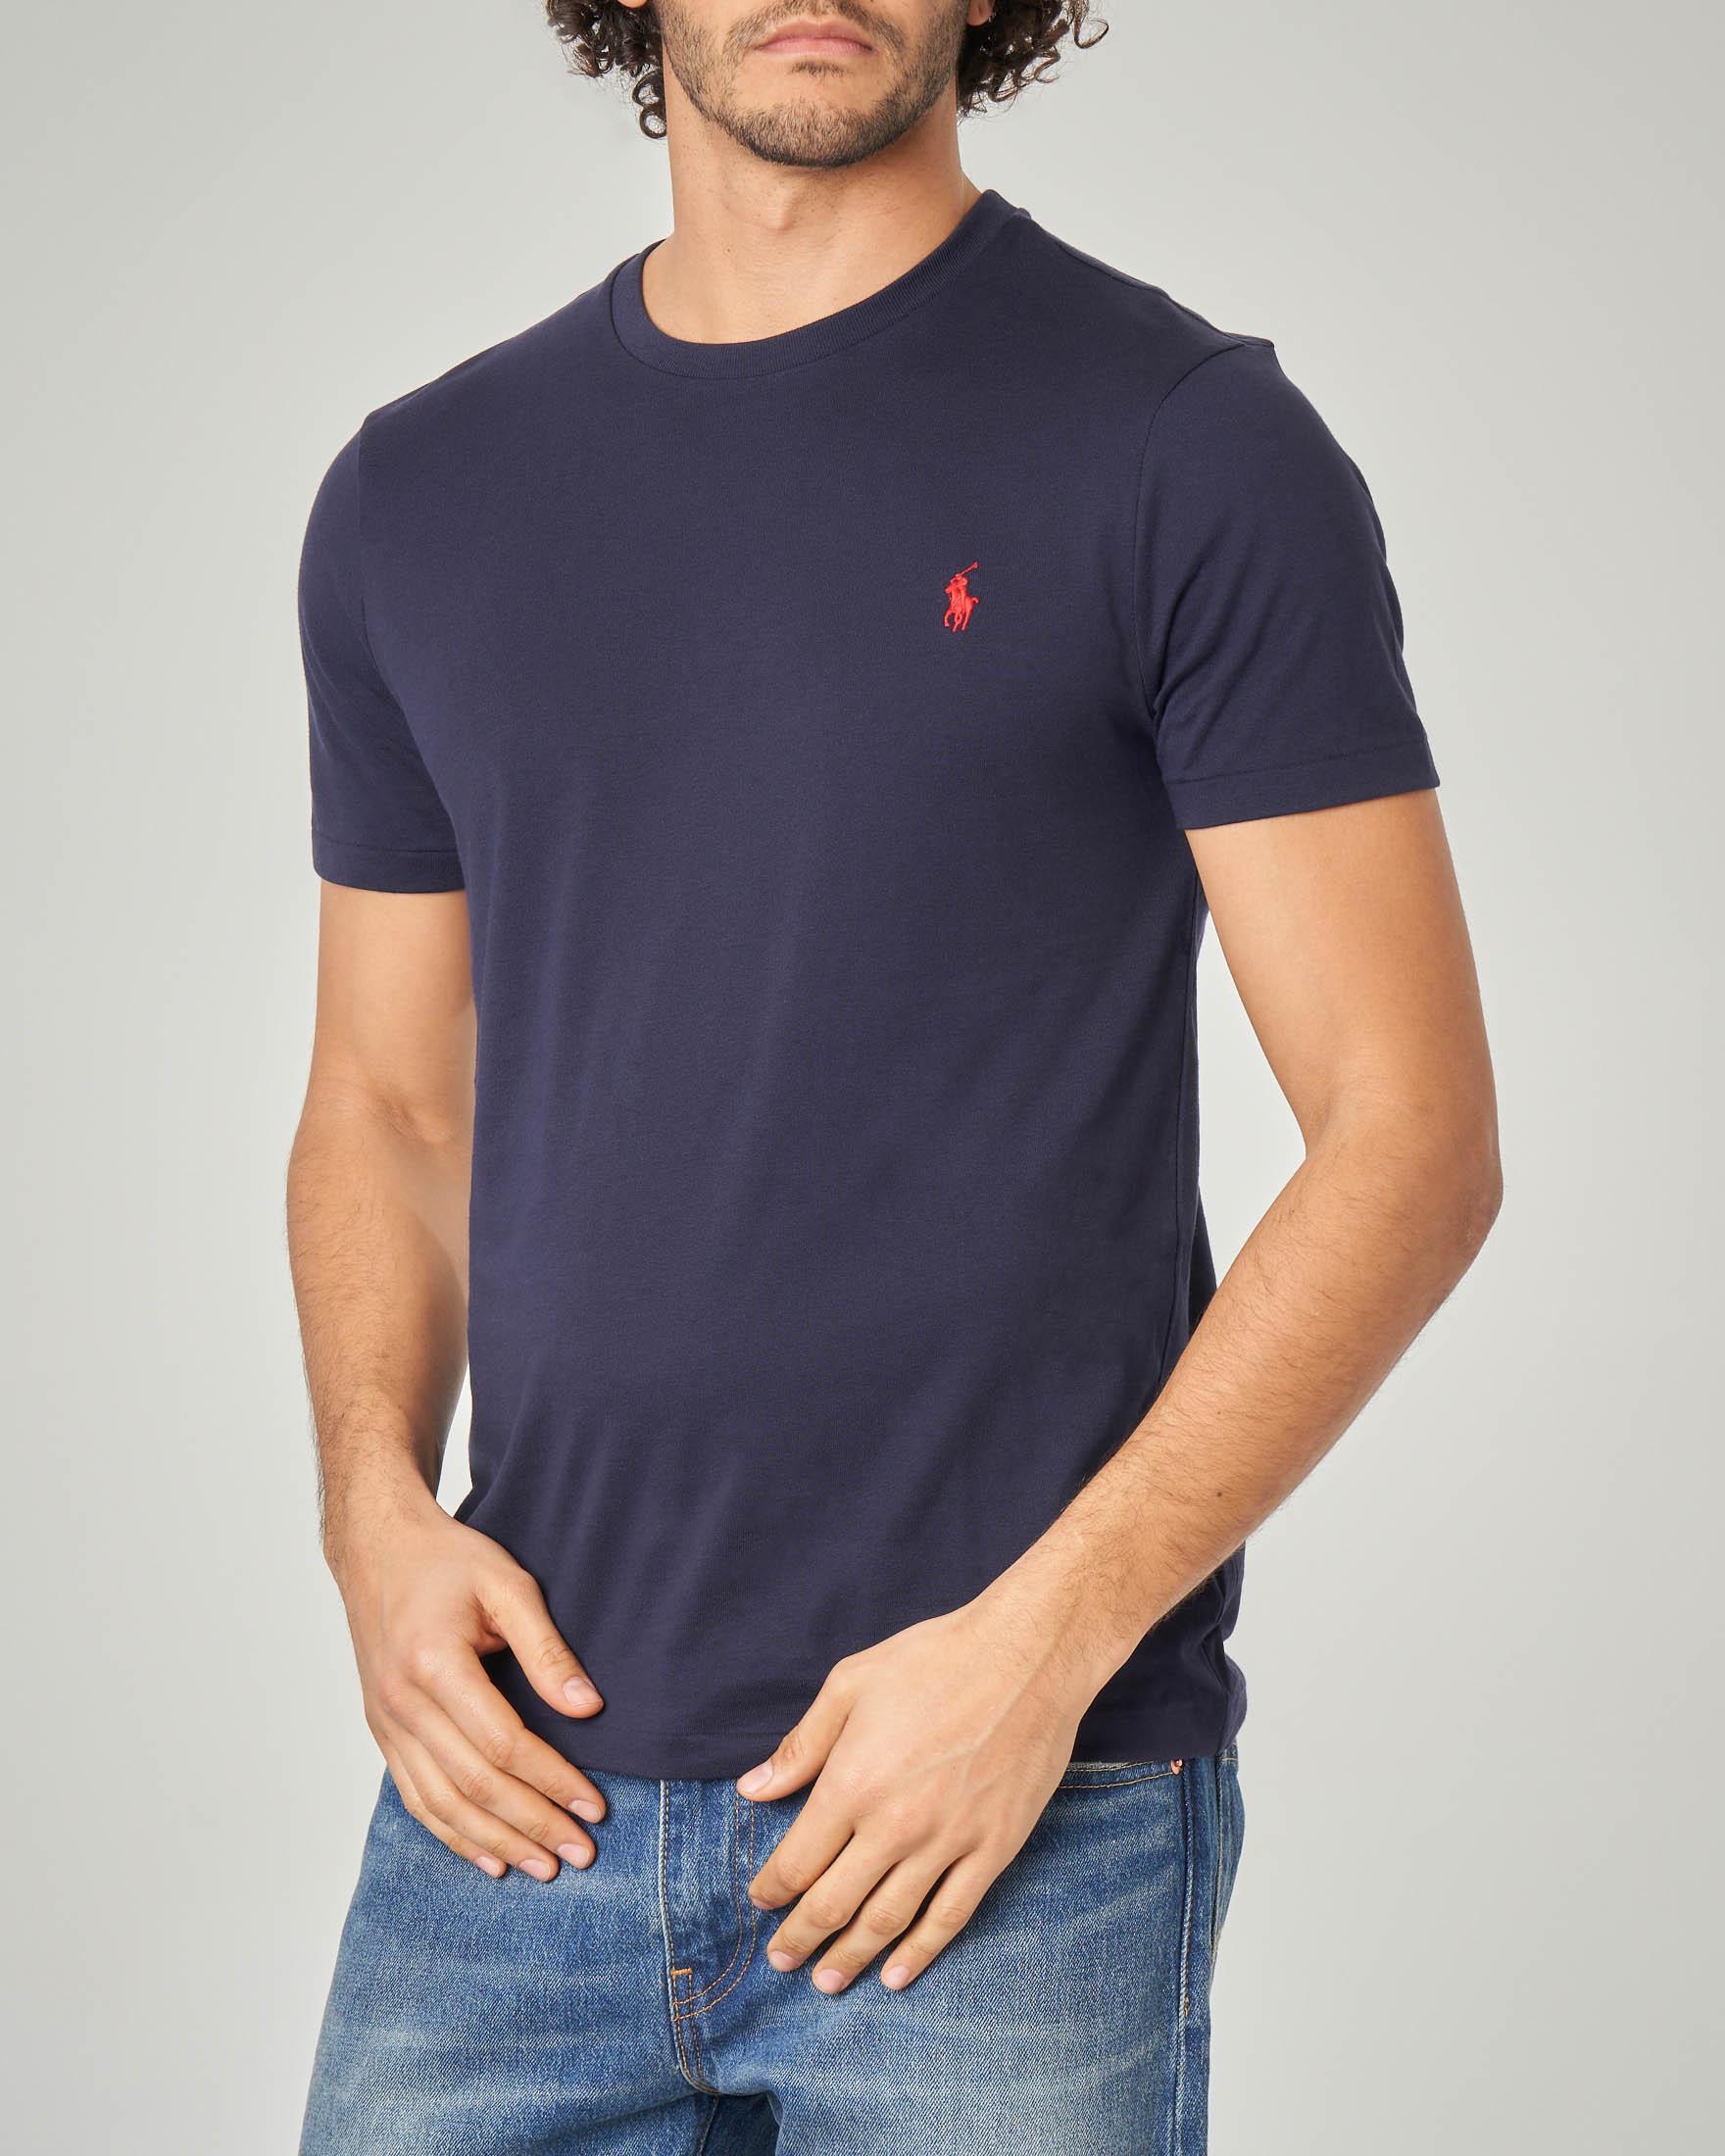 T-shirt blu con logo rosso